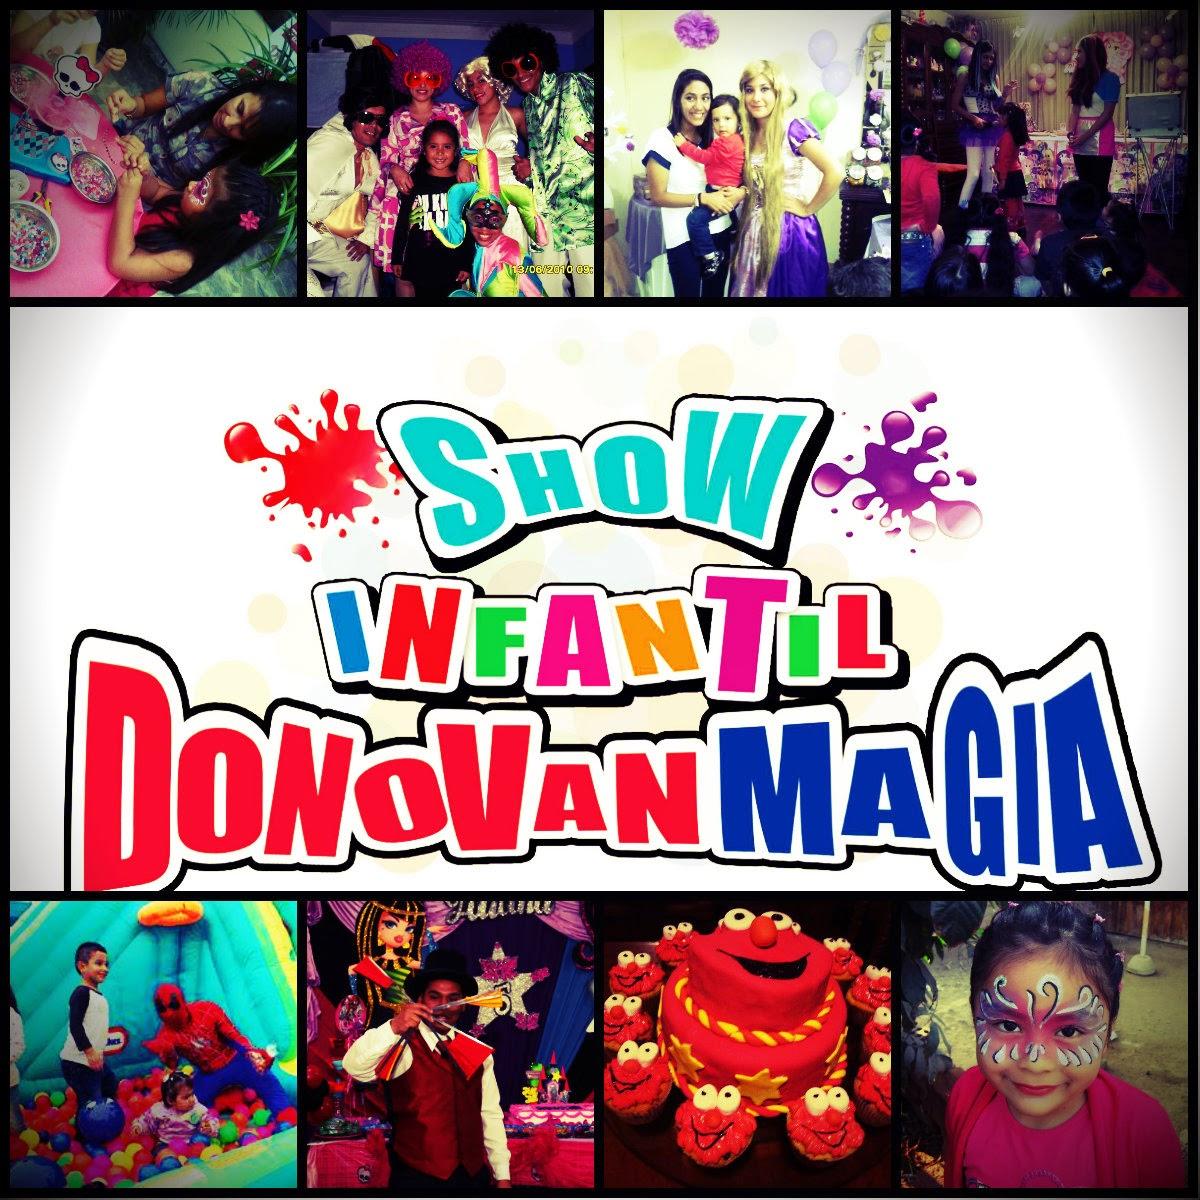 Show infantil donovanmagia